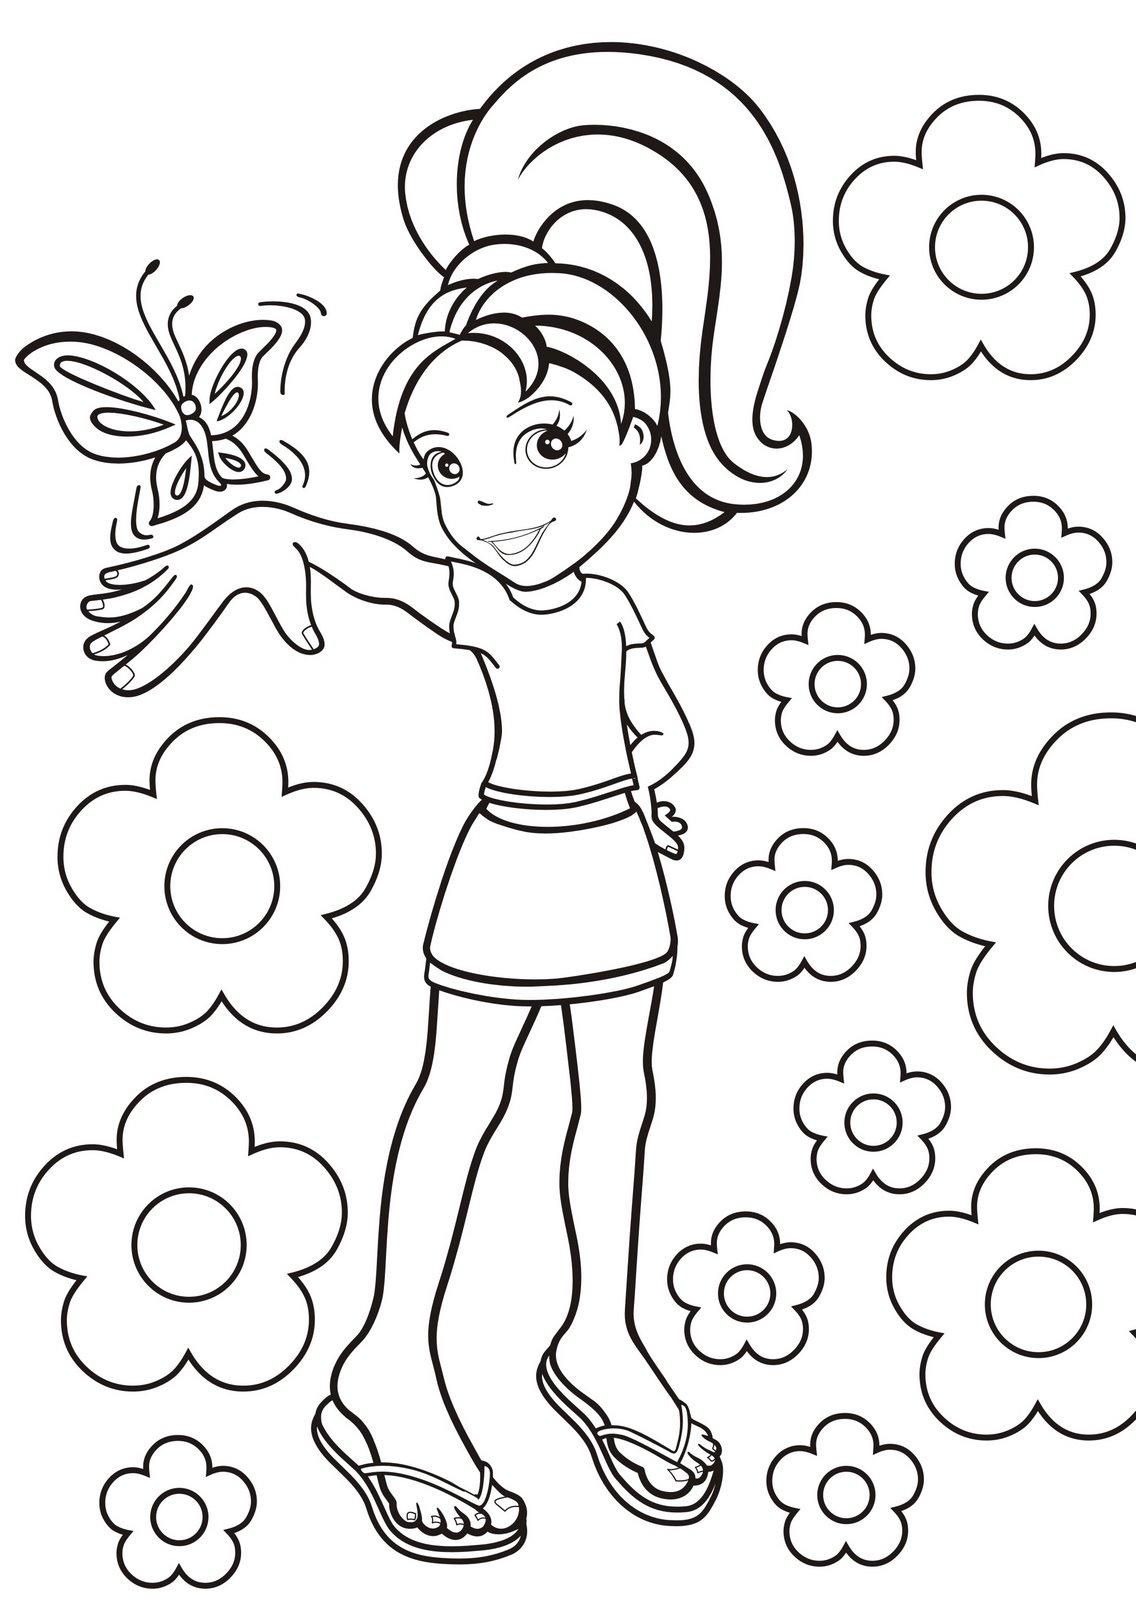 Desenho Para Imprimir E Pintar Da Polly